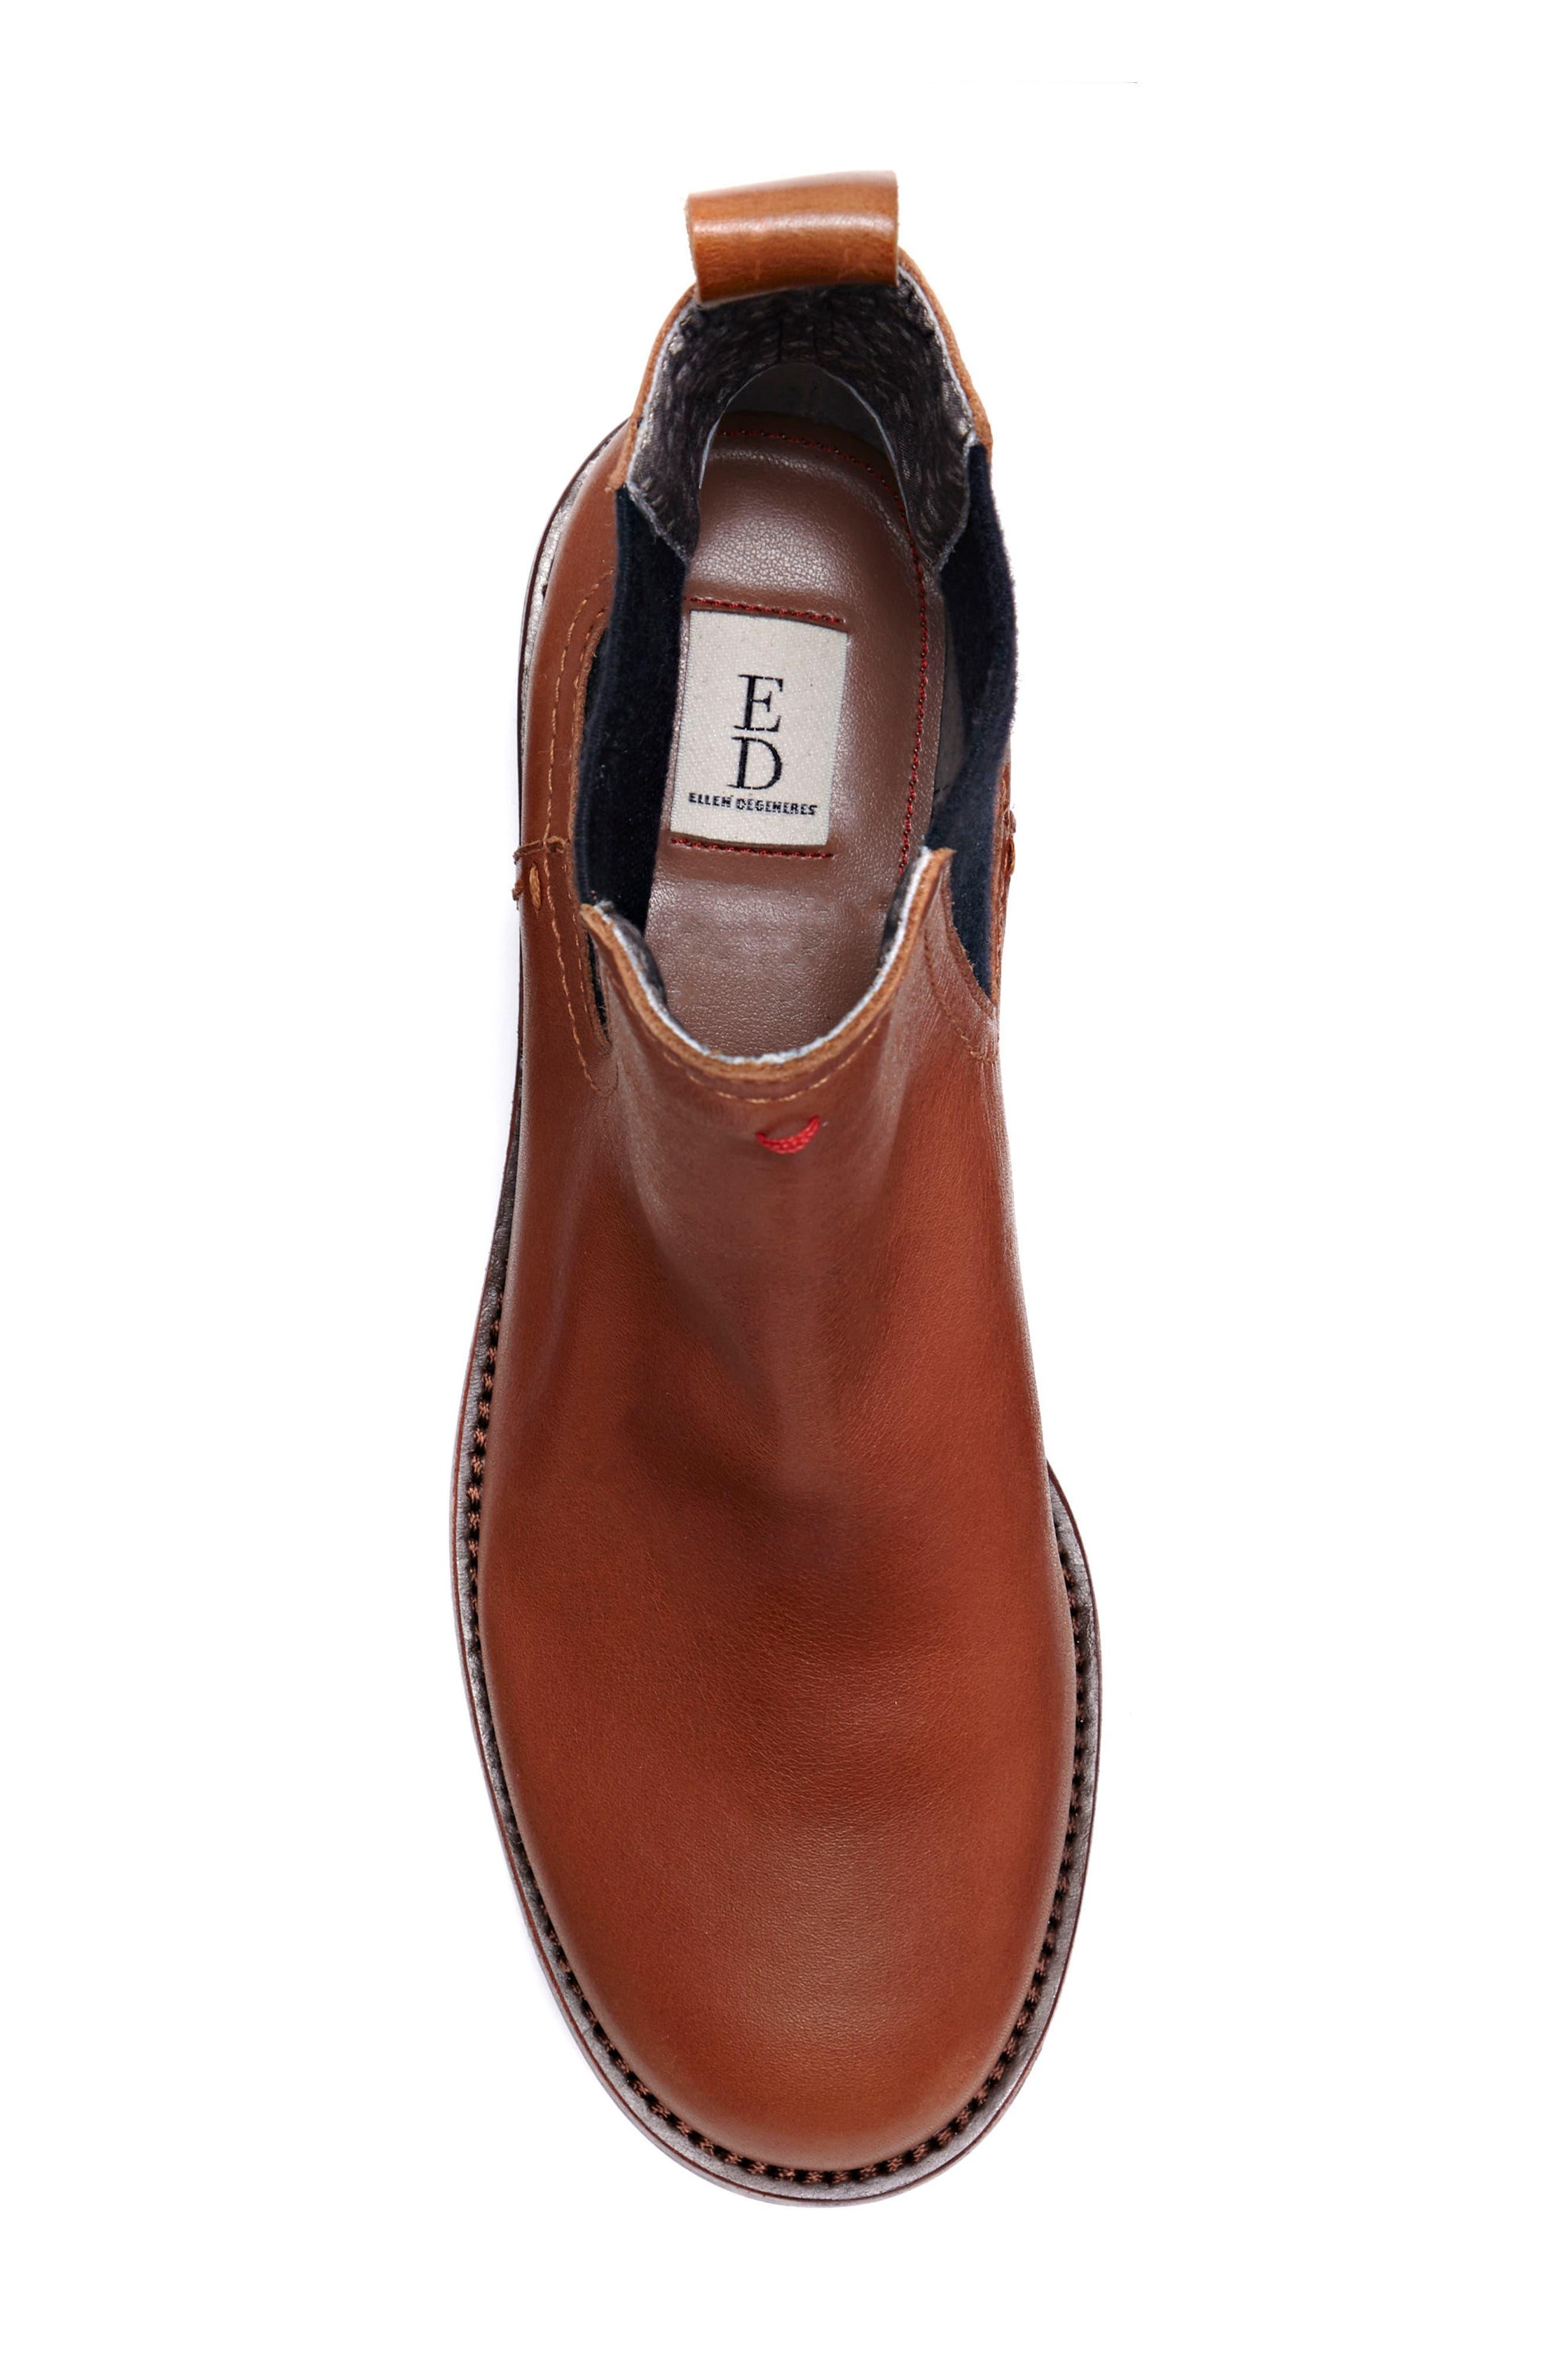 Zabi Chelsea Boot,                             Alternate thumbnail 4, color,                             Yam Leather